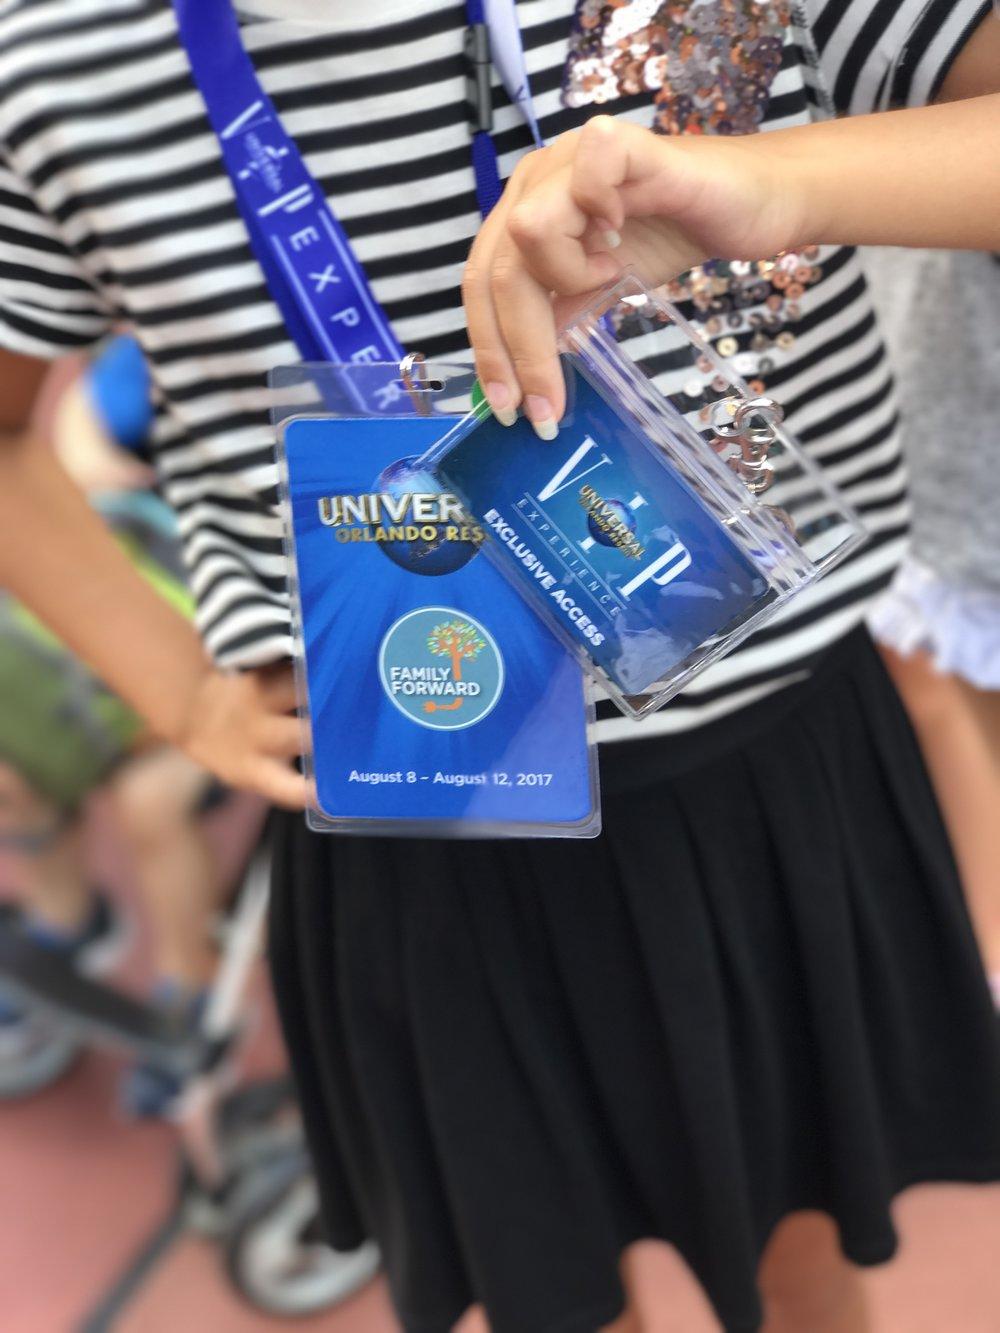 VIP Experience at Universal Orlando